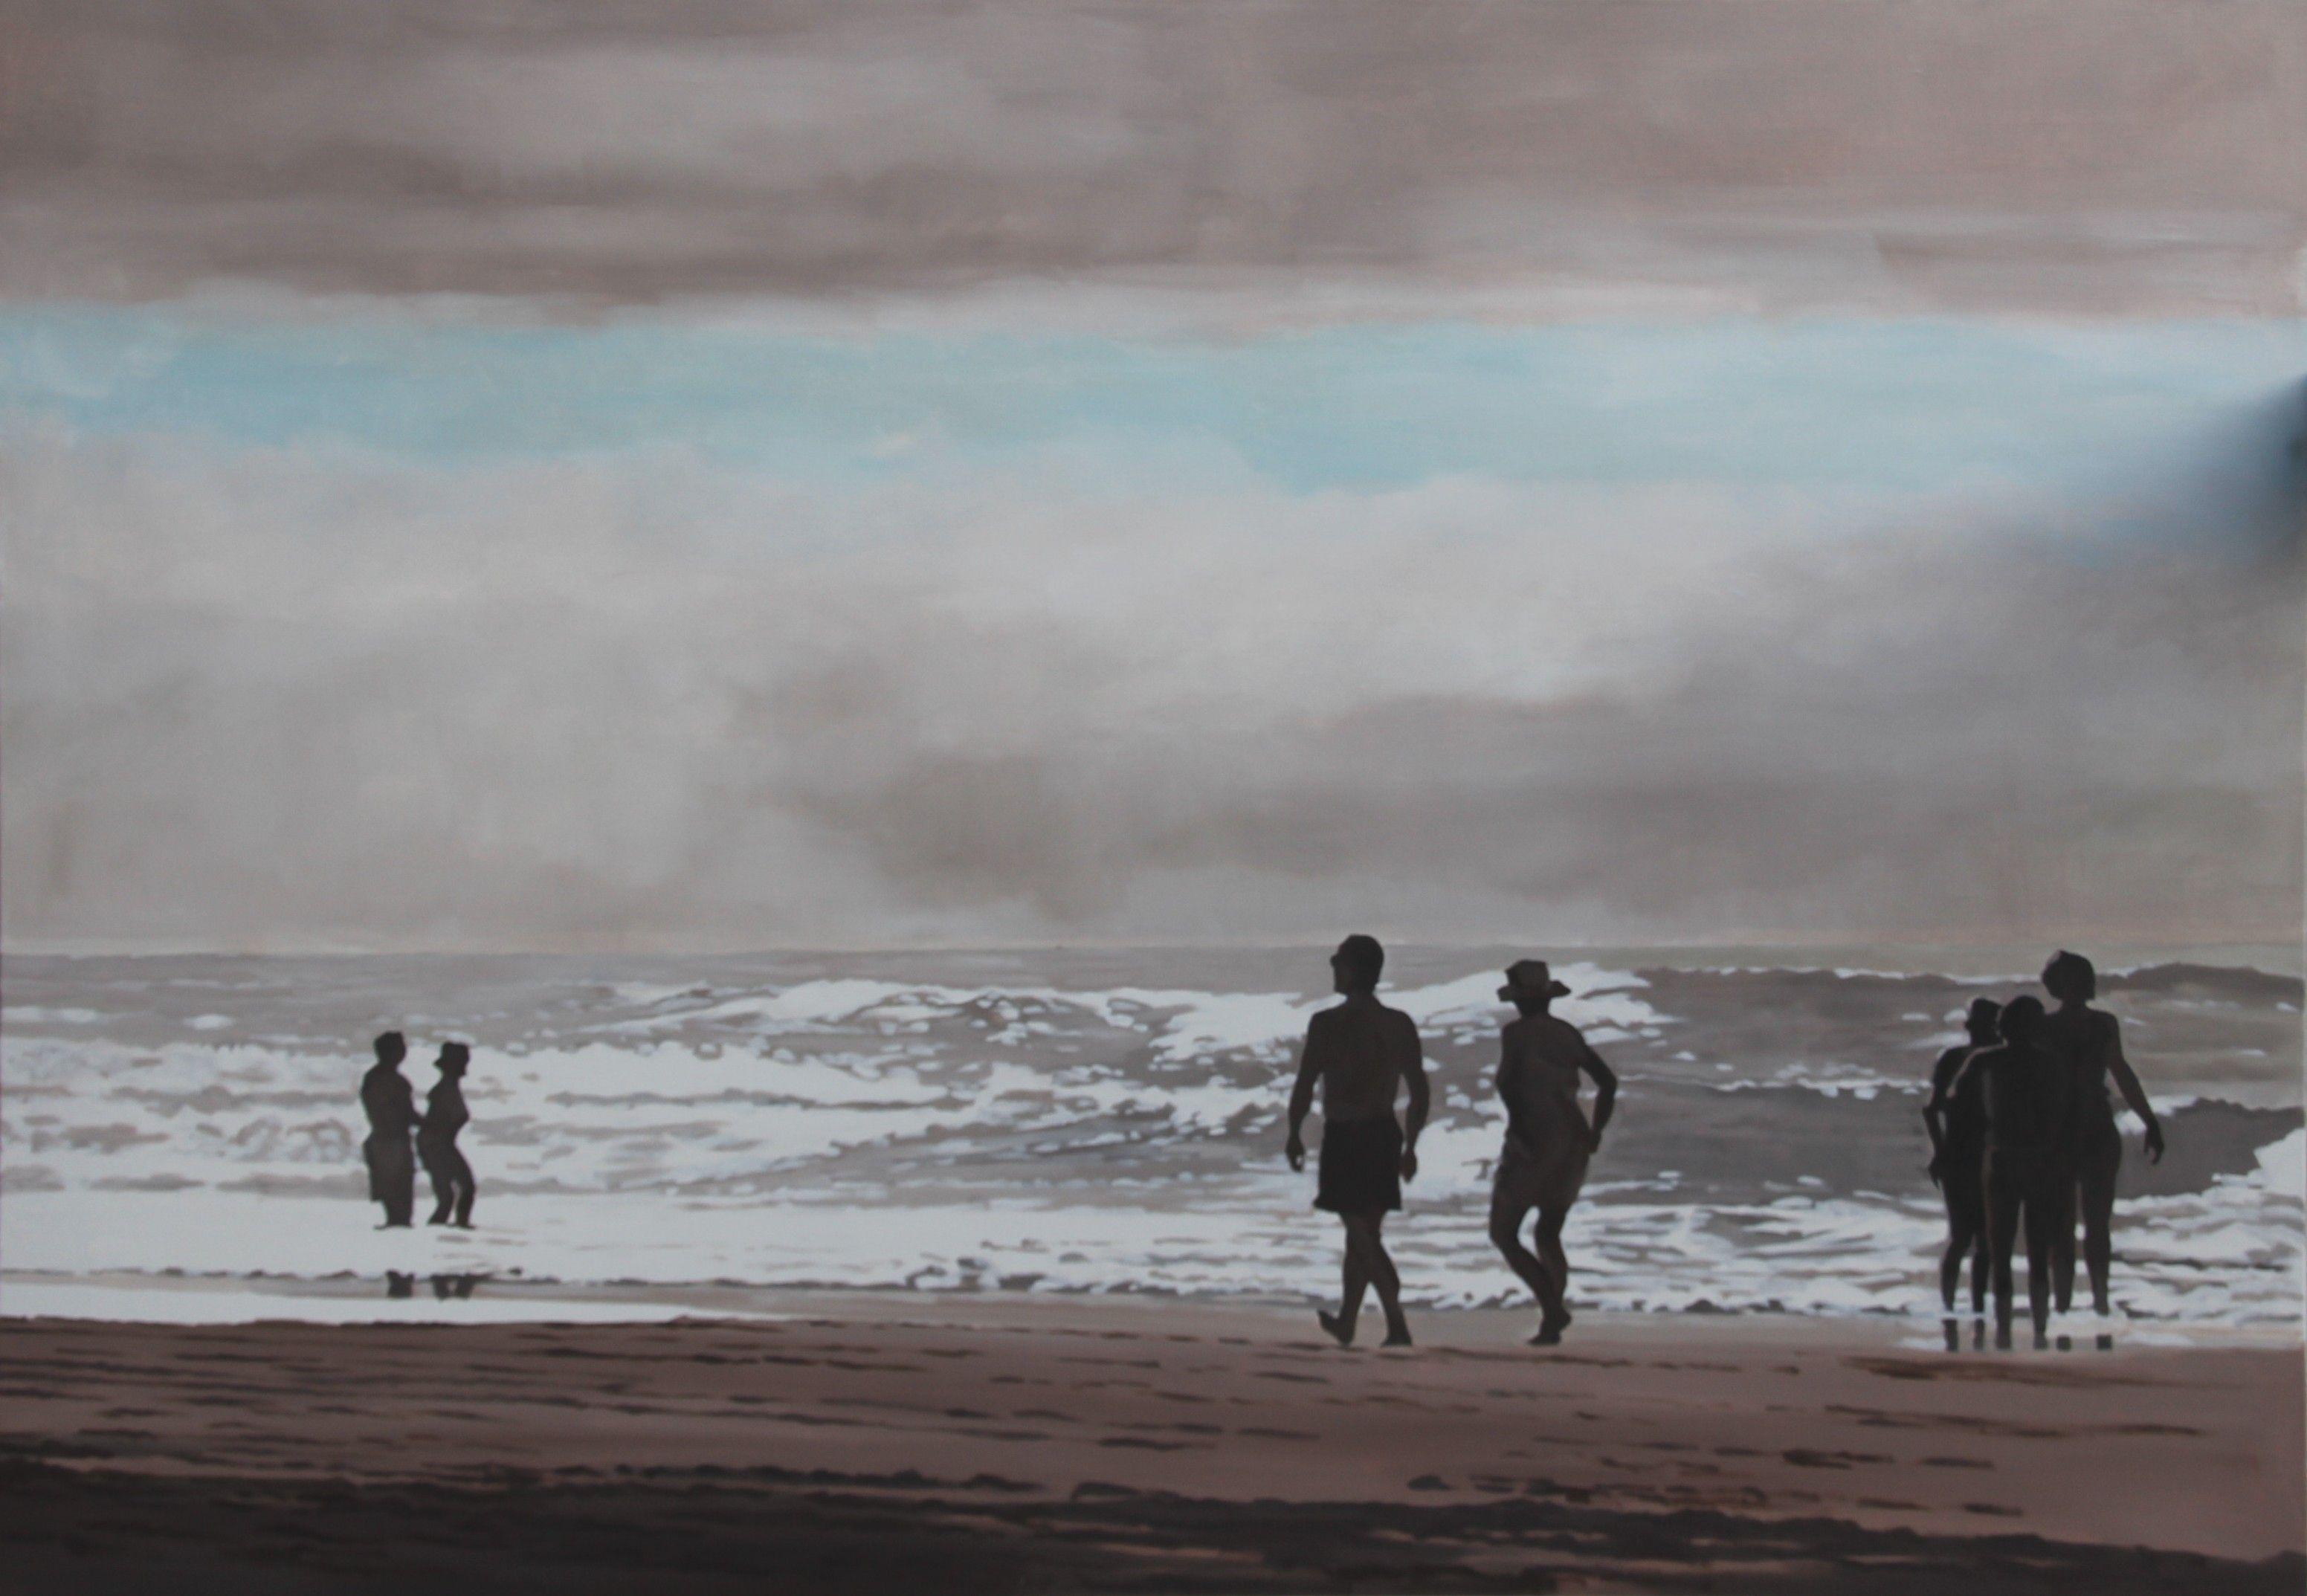 Embruns - Nicolas Odinet #plage #beach #seaside #borddemer #mer #enfant #famille #bleu #houle #vague #Odinet #peinture #oilpainting #art #Hopper #Light #afternoon #fineart #artcontemporain #art #marciano #gallery #galerie #Paris #rivoli